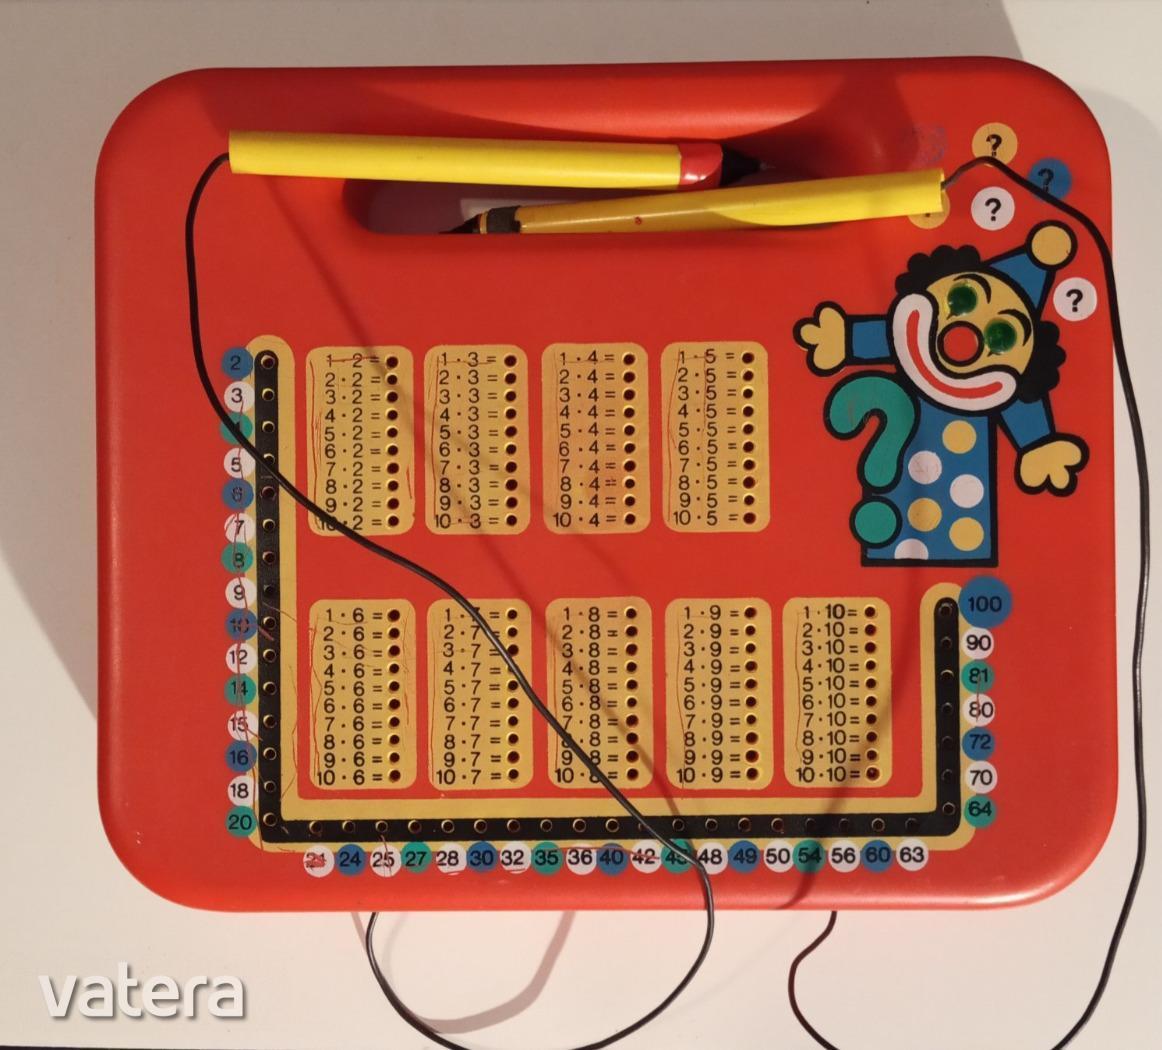 retro-mukodo-elektromos-szorzotabla-bc3b_1_big.jpg